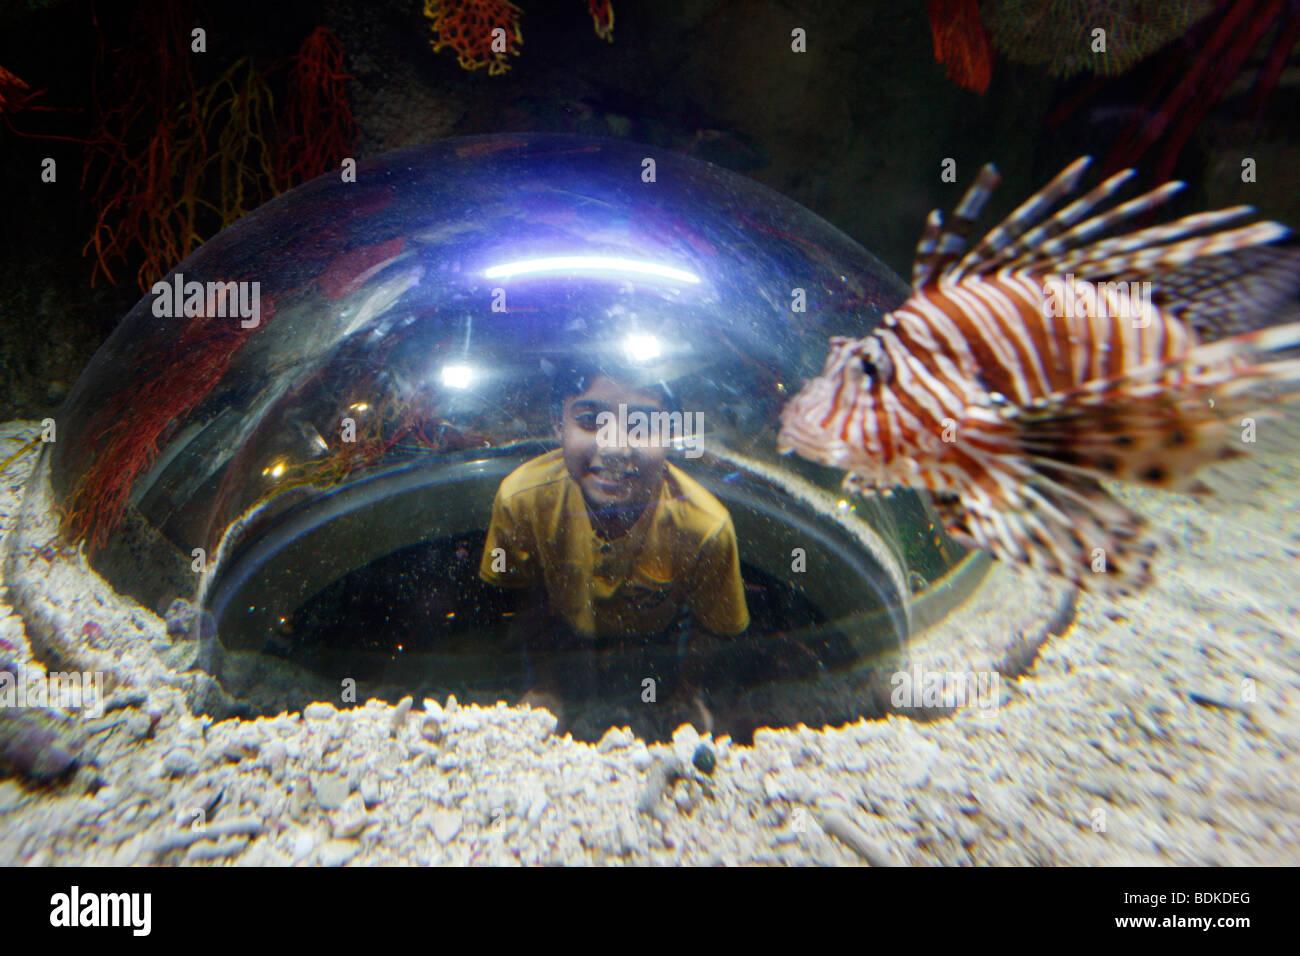 Dubai Aquarium and underwater Zoo, part of Dubai Mall in Downtown Dubai, new part of the city, Dubai, United Arab - Stock Image